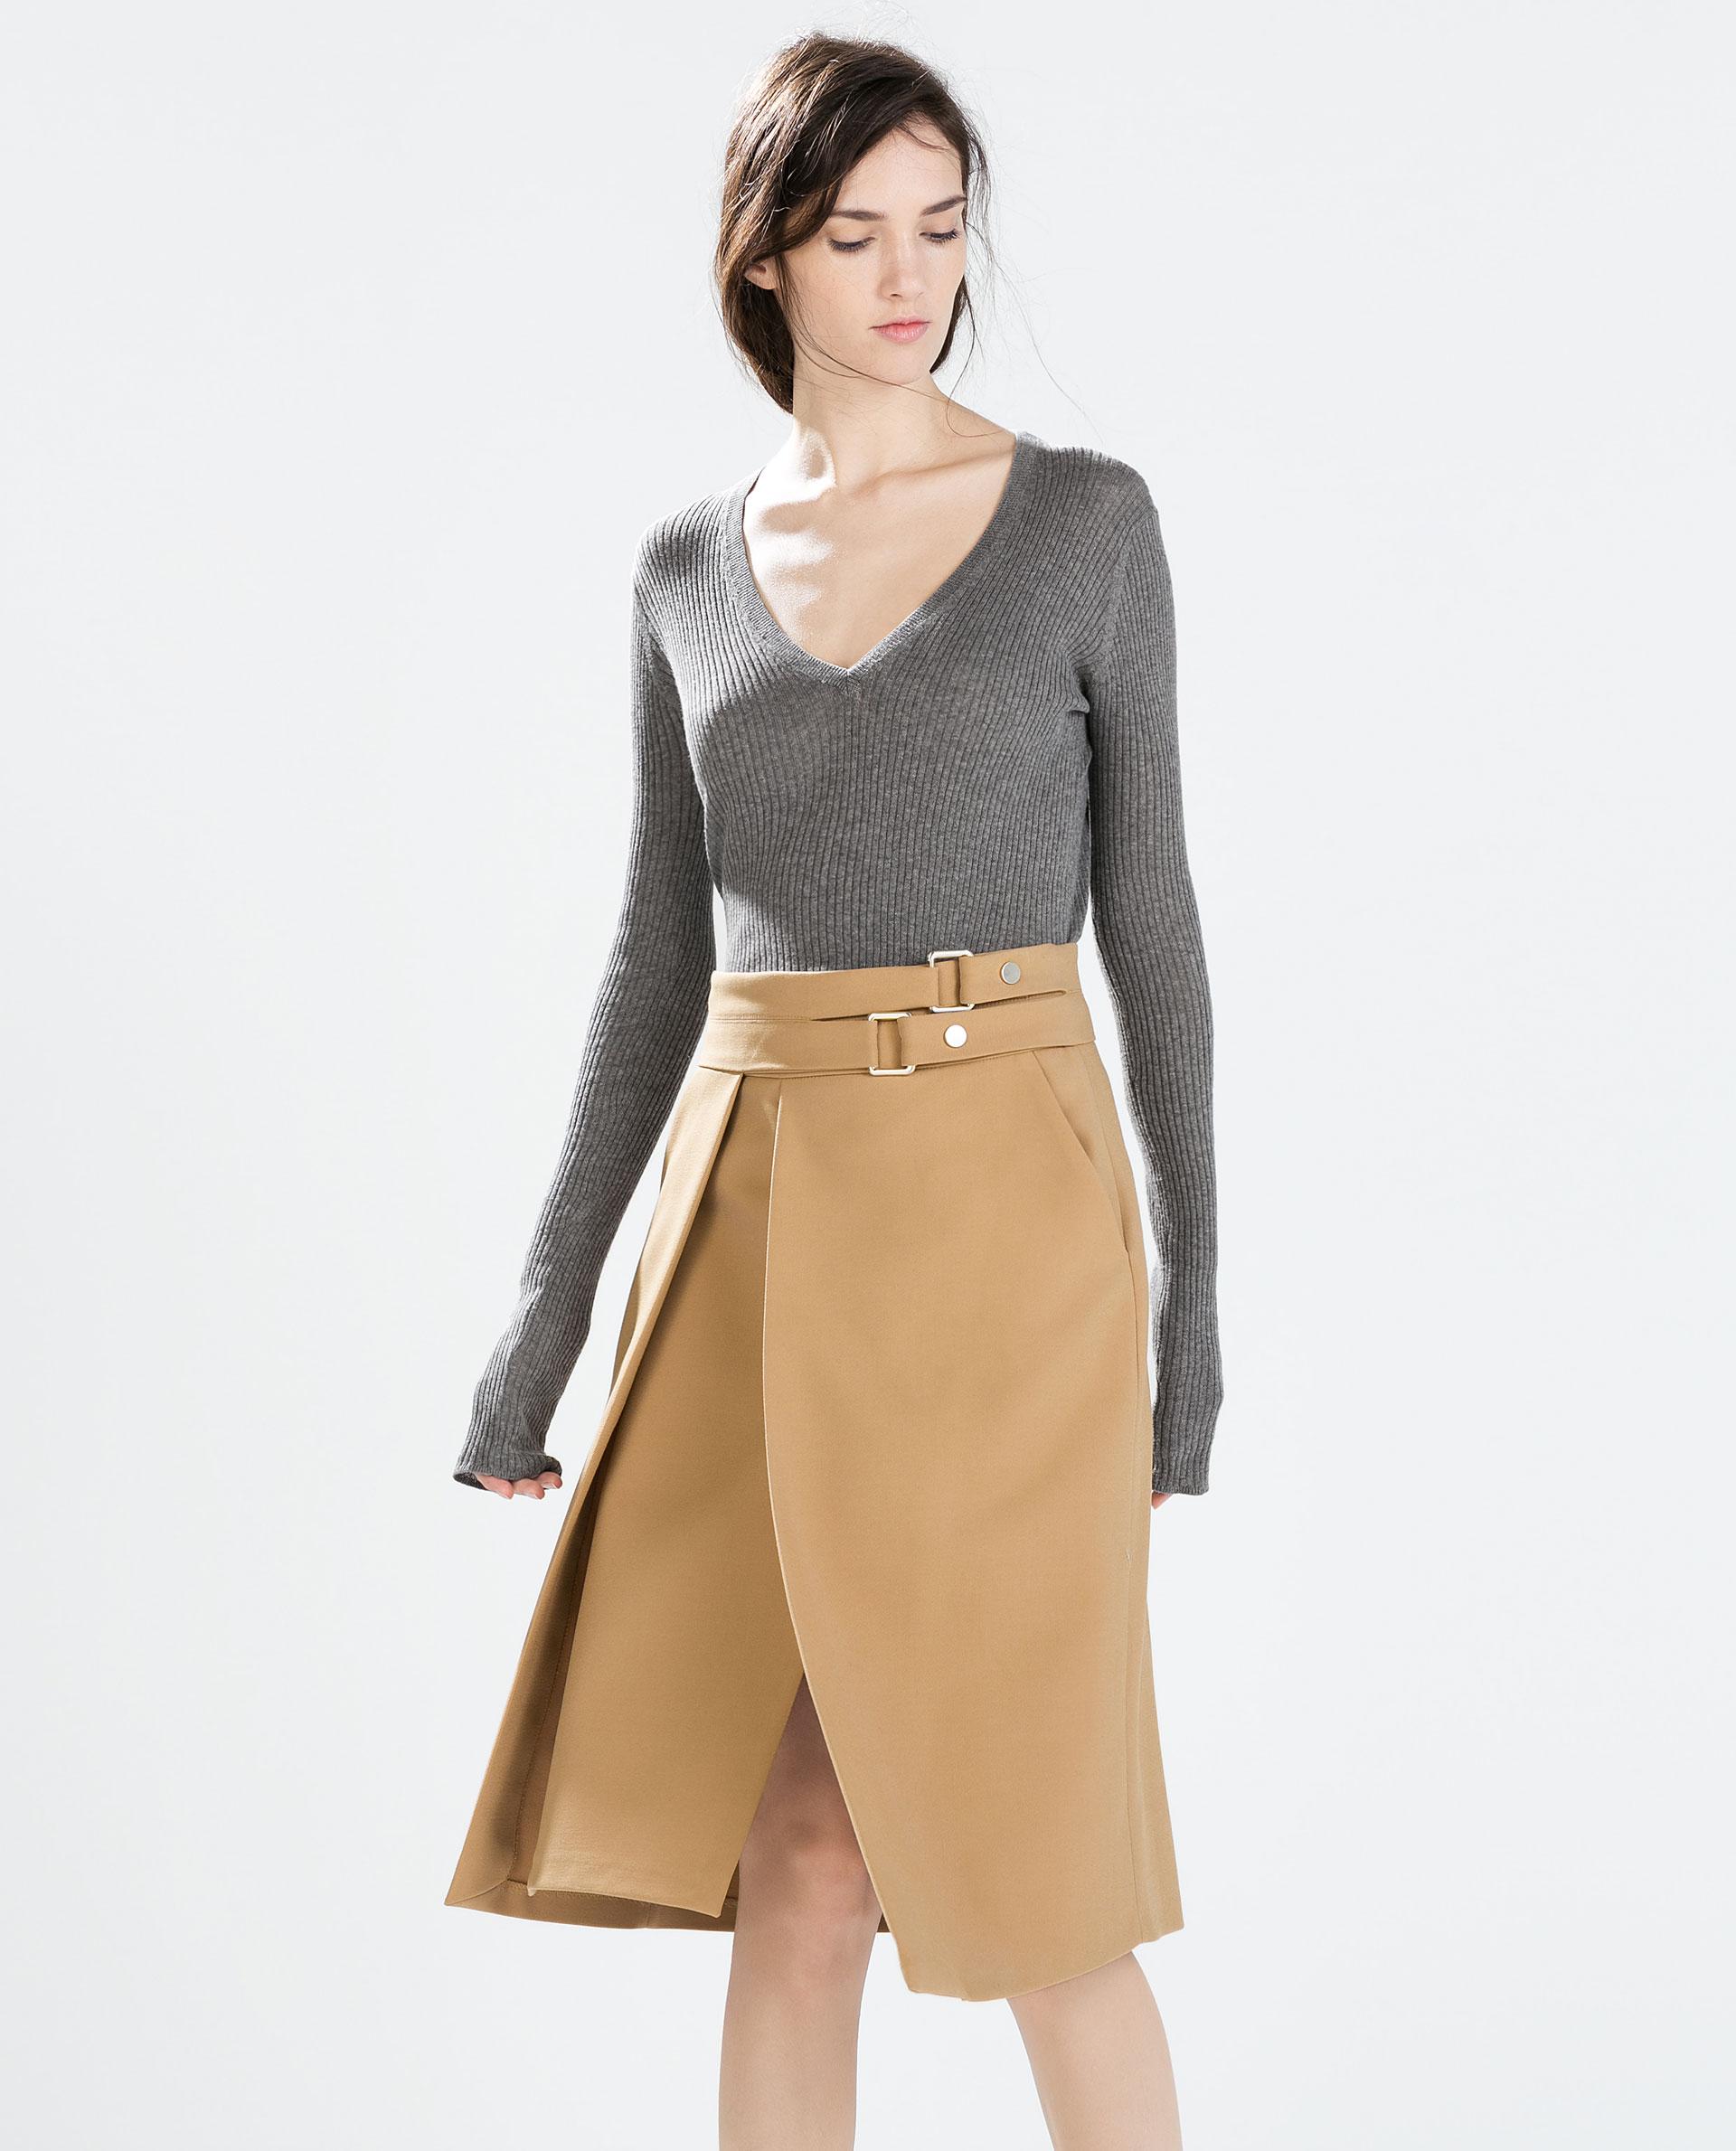 BUCKLE SKIRT - Skirts - WOMAN | ZARA United States